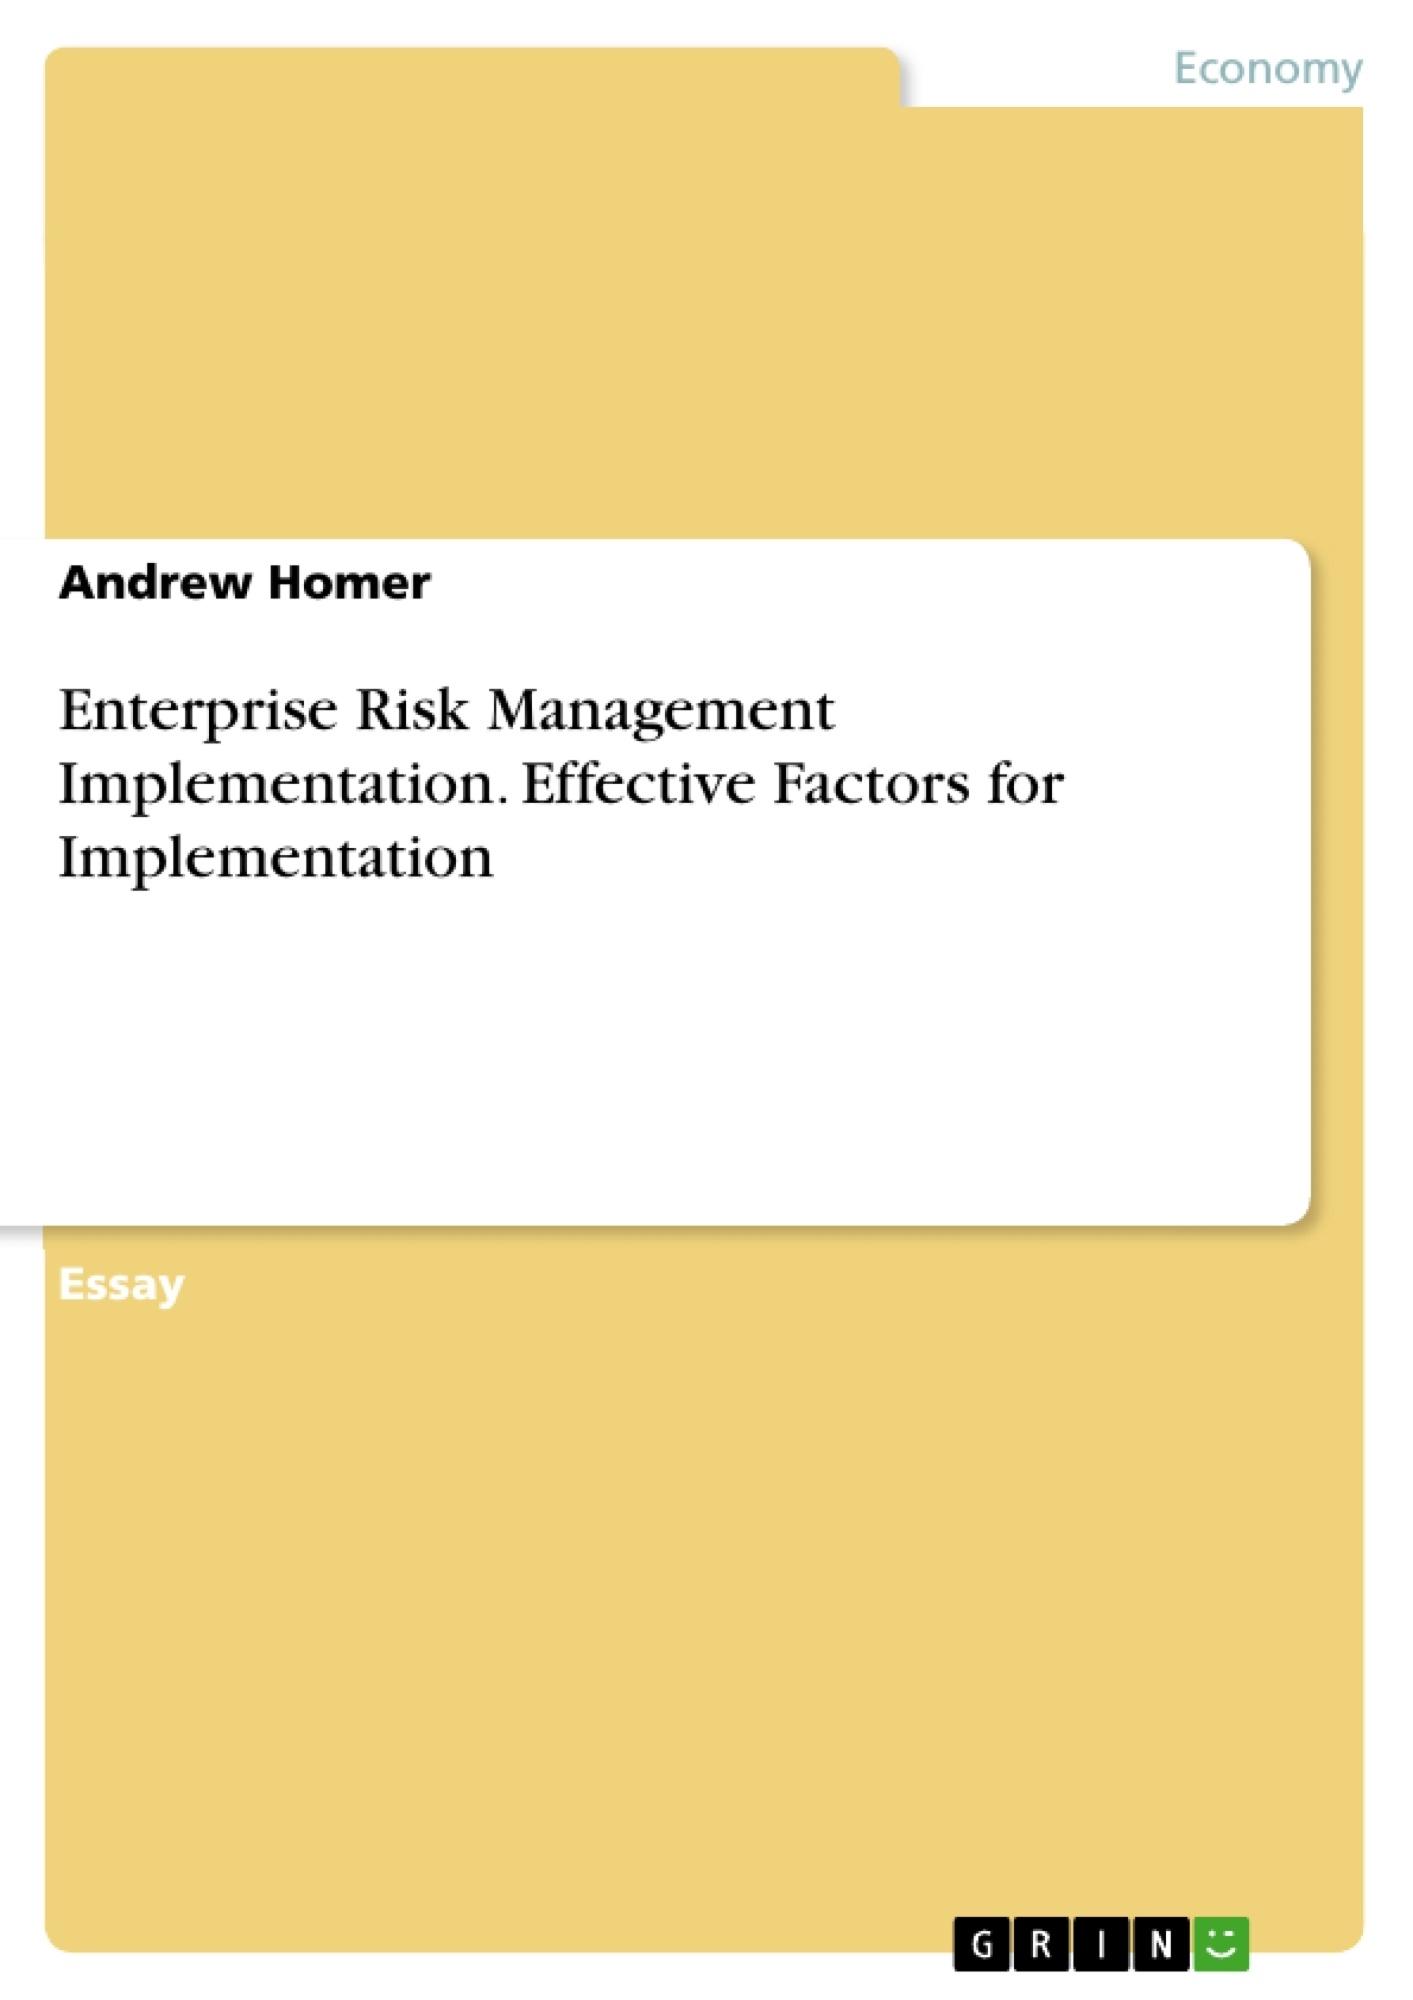 Title: Enterprise Risk Management Implementation. Effective Factors for Implementation